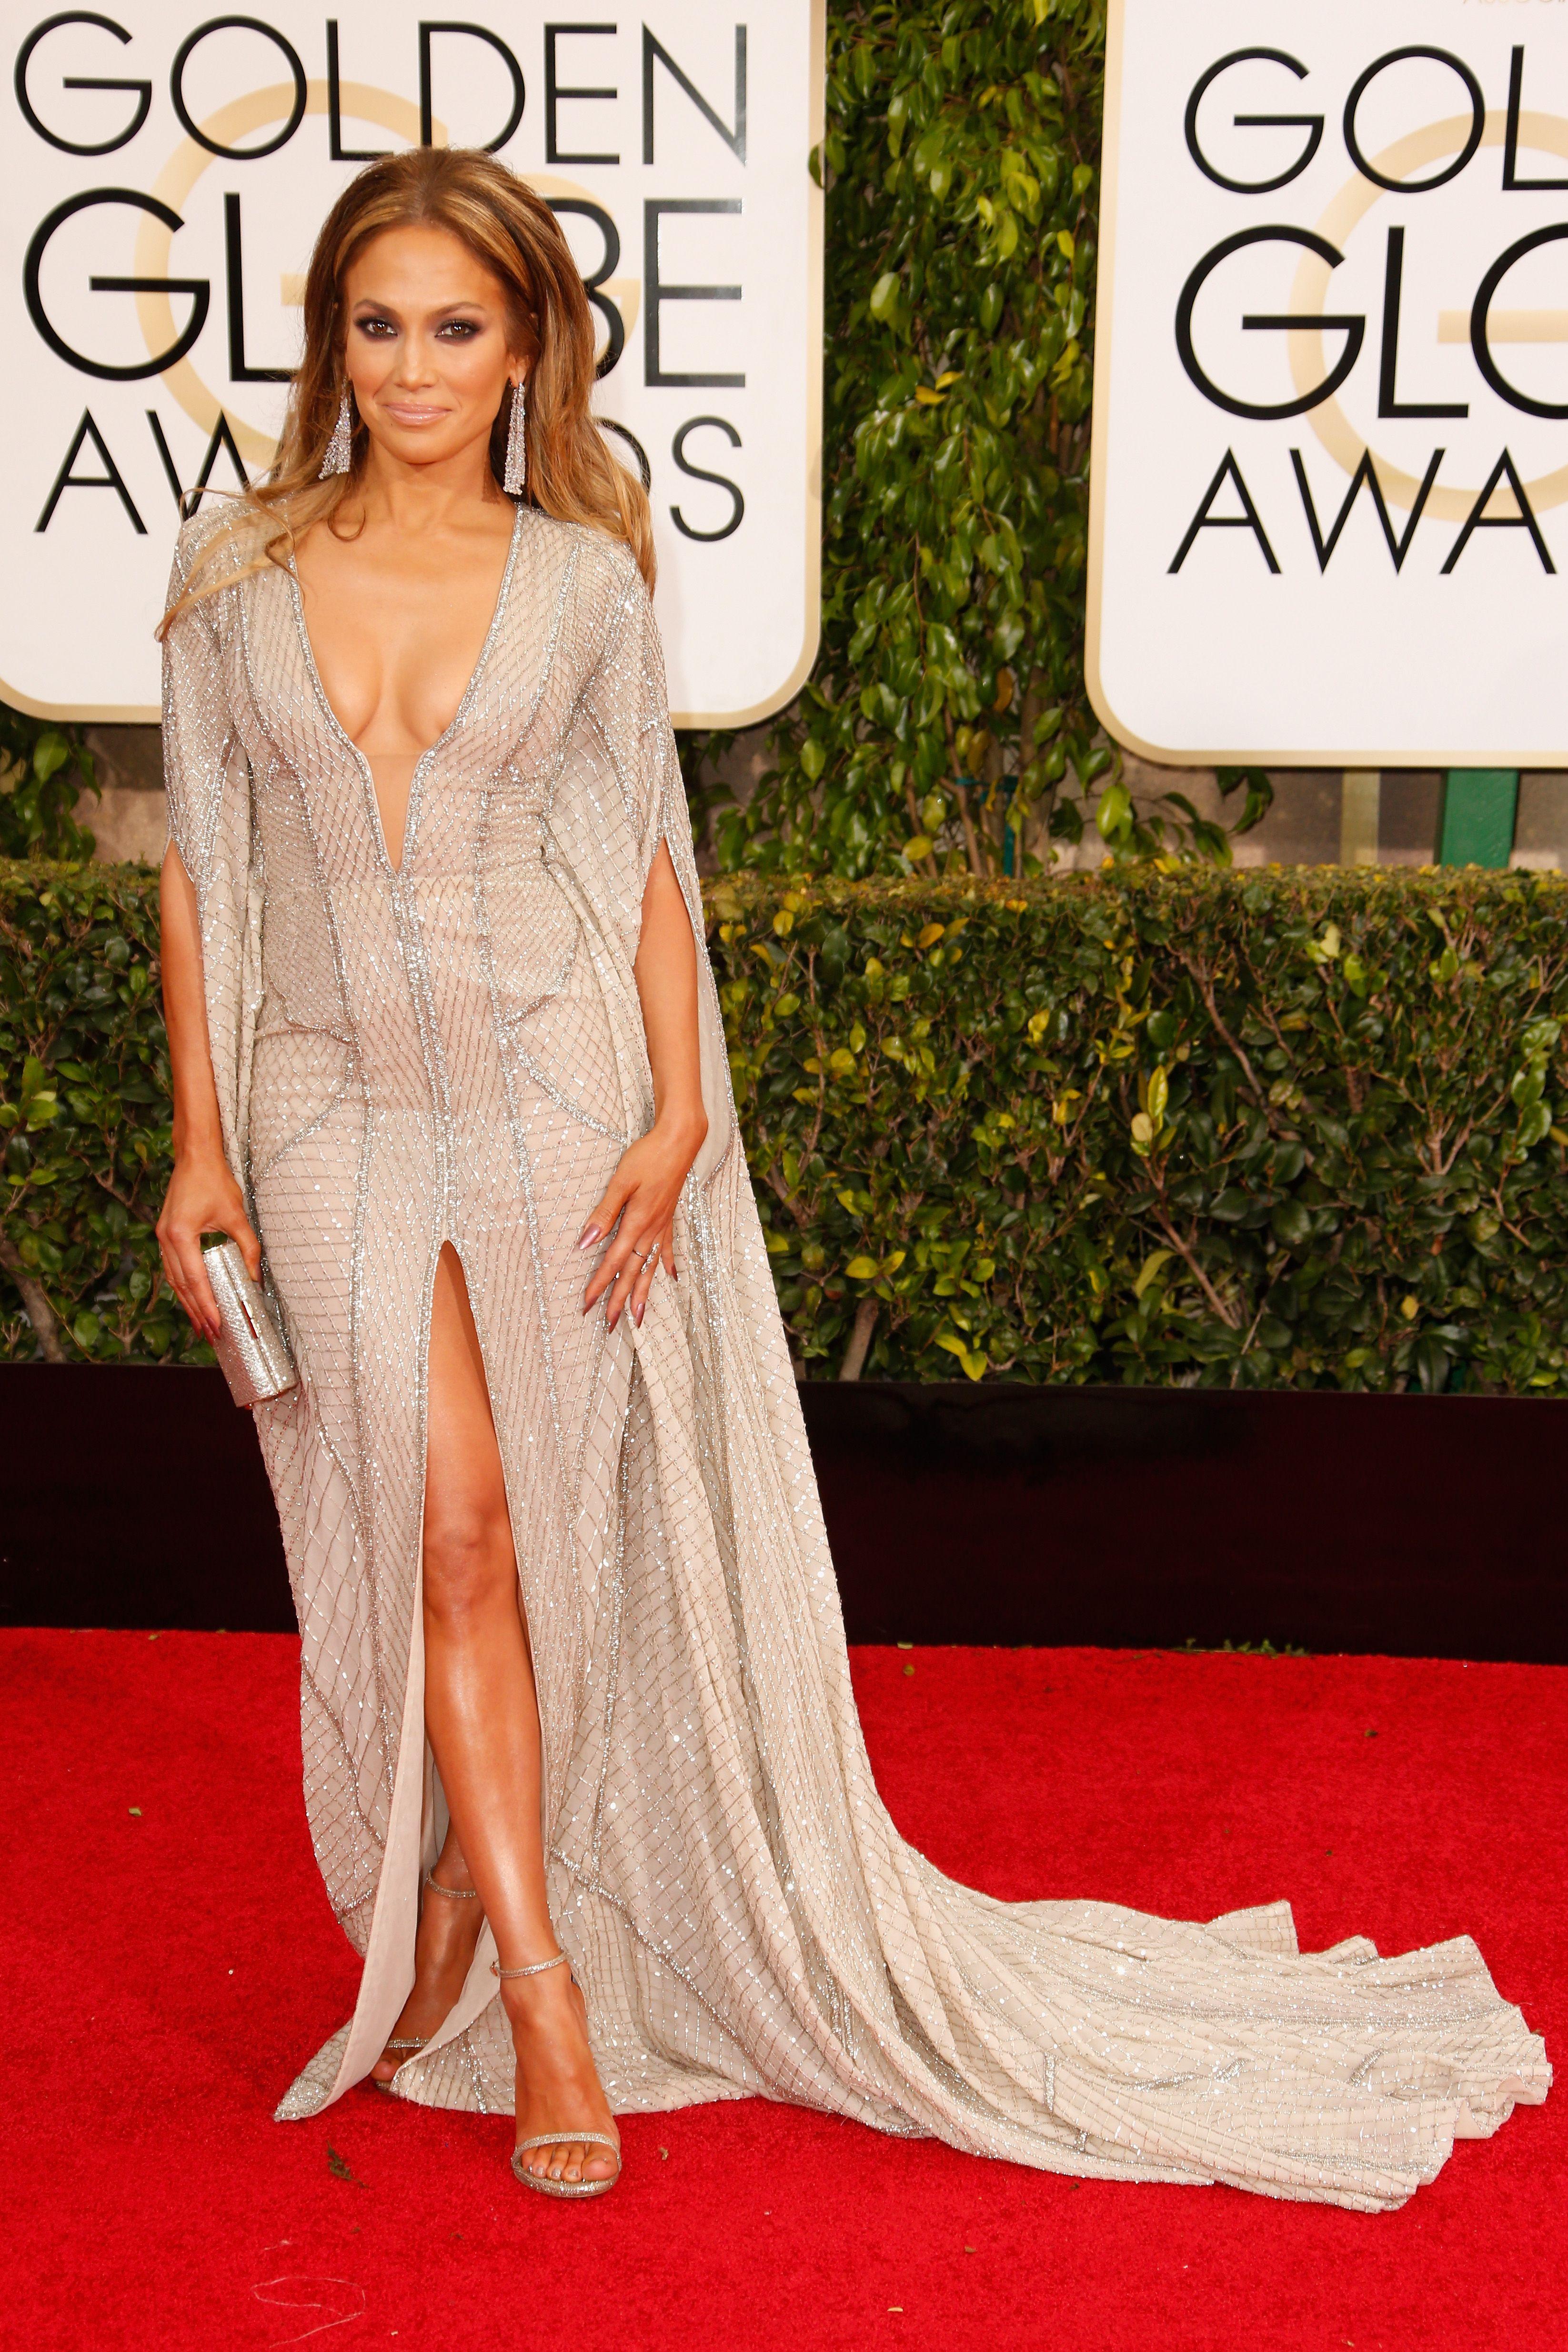 Jennifer Lopez Miiiight Have Had a Nip Slip at the Golden Globes